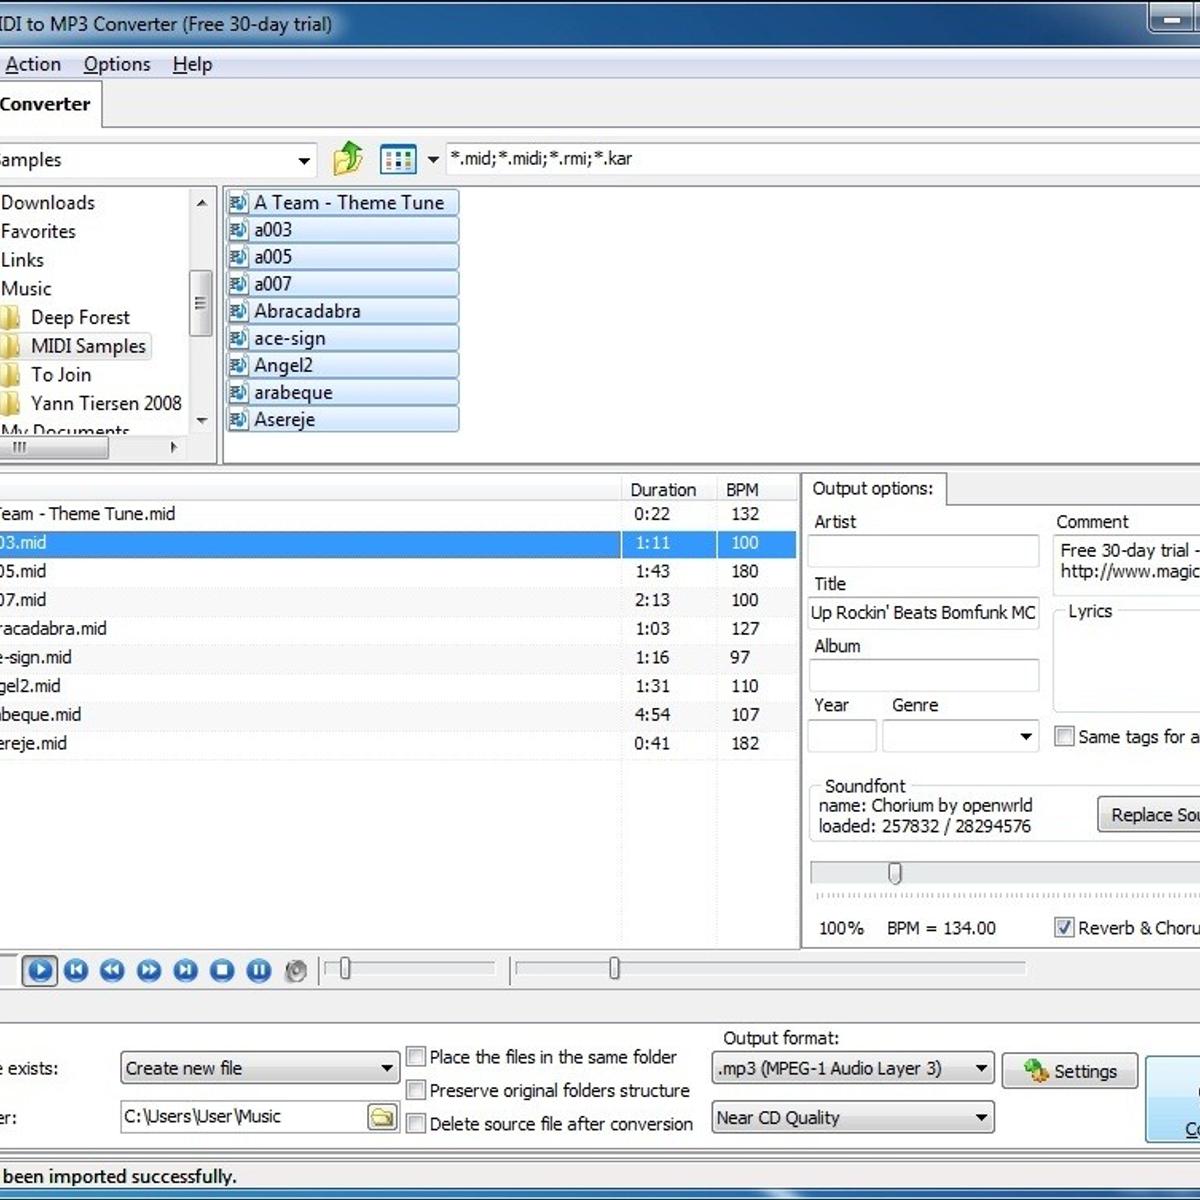 Magic MIDI to MP3 Converter Alternatives and Similar